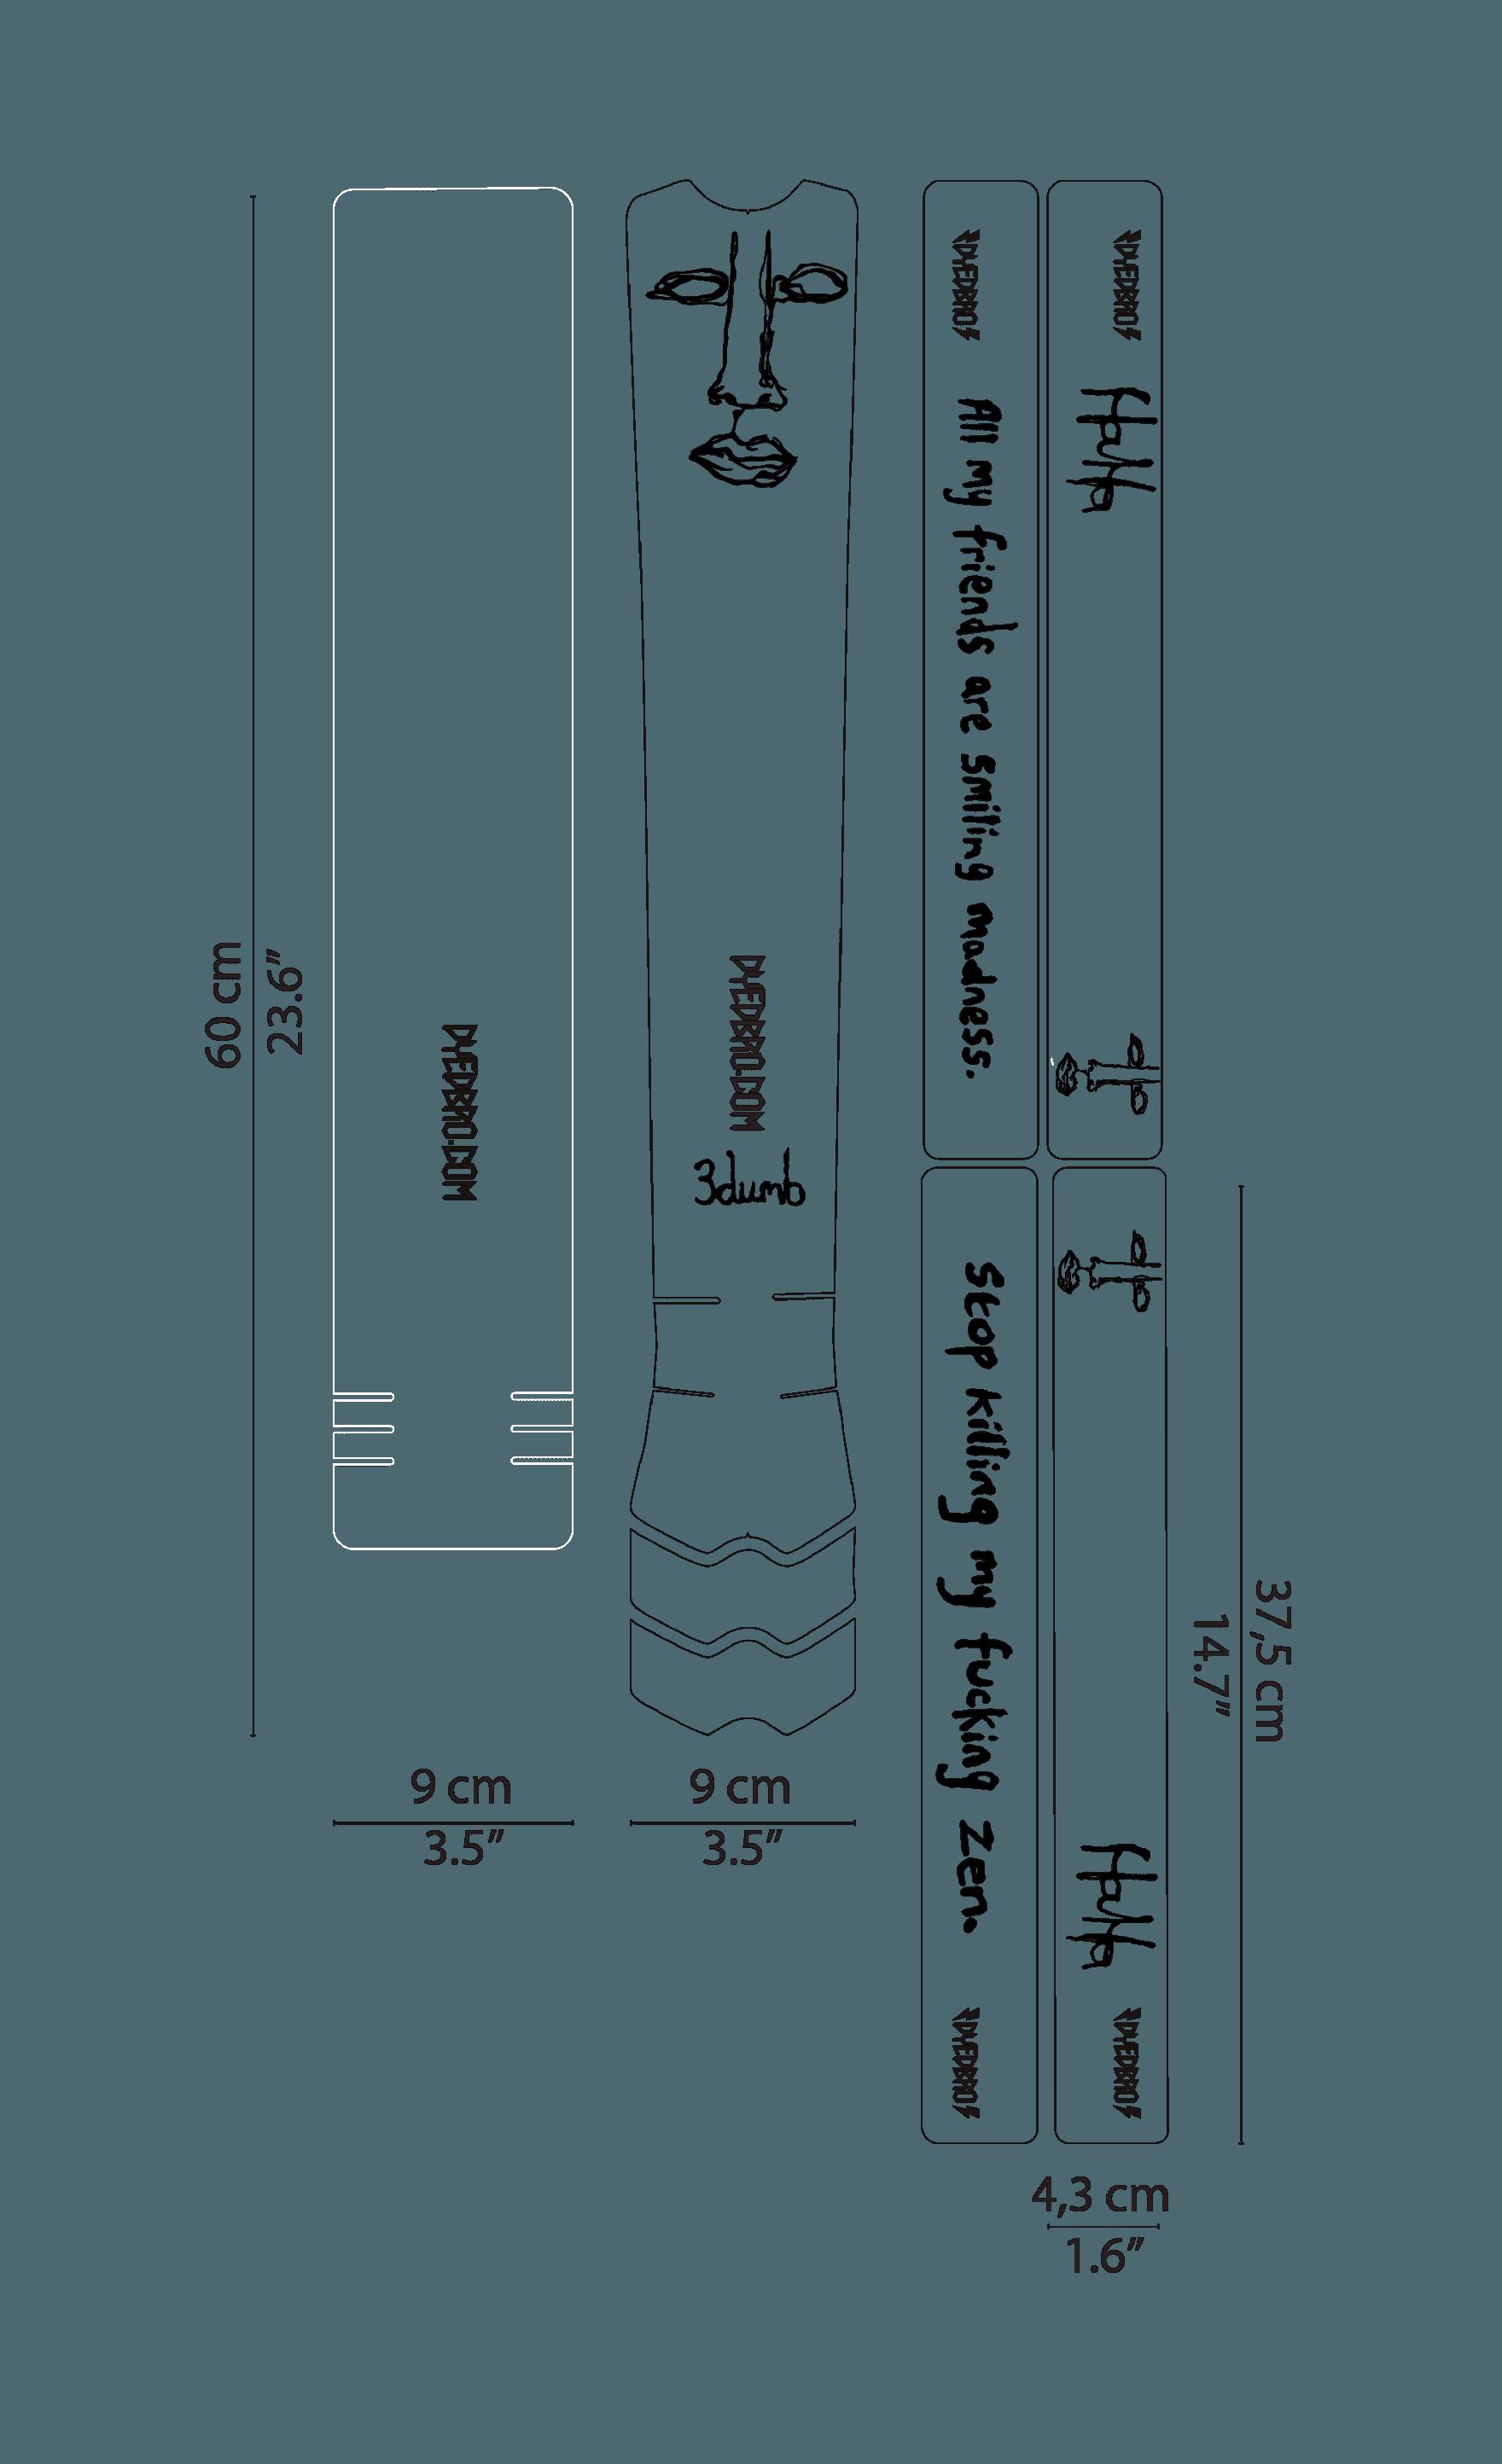 DYEDBRO 3 DUMB BLACK 01